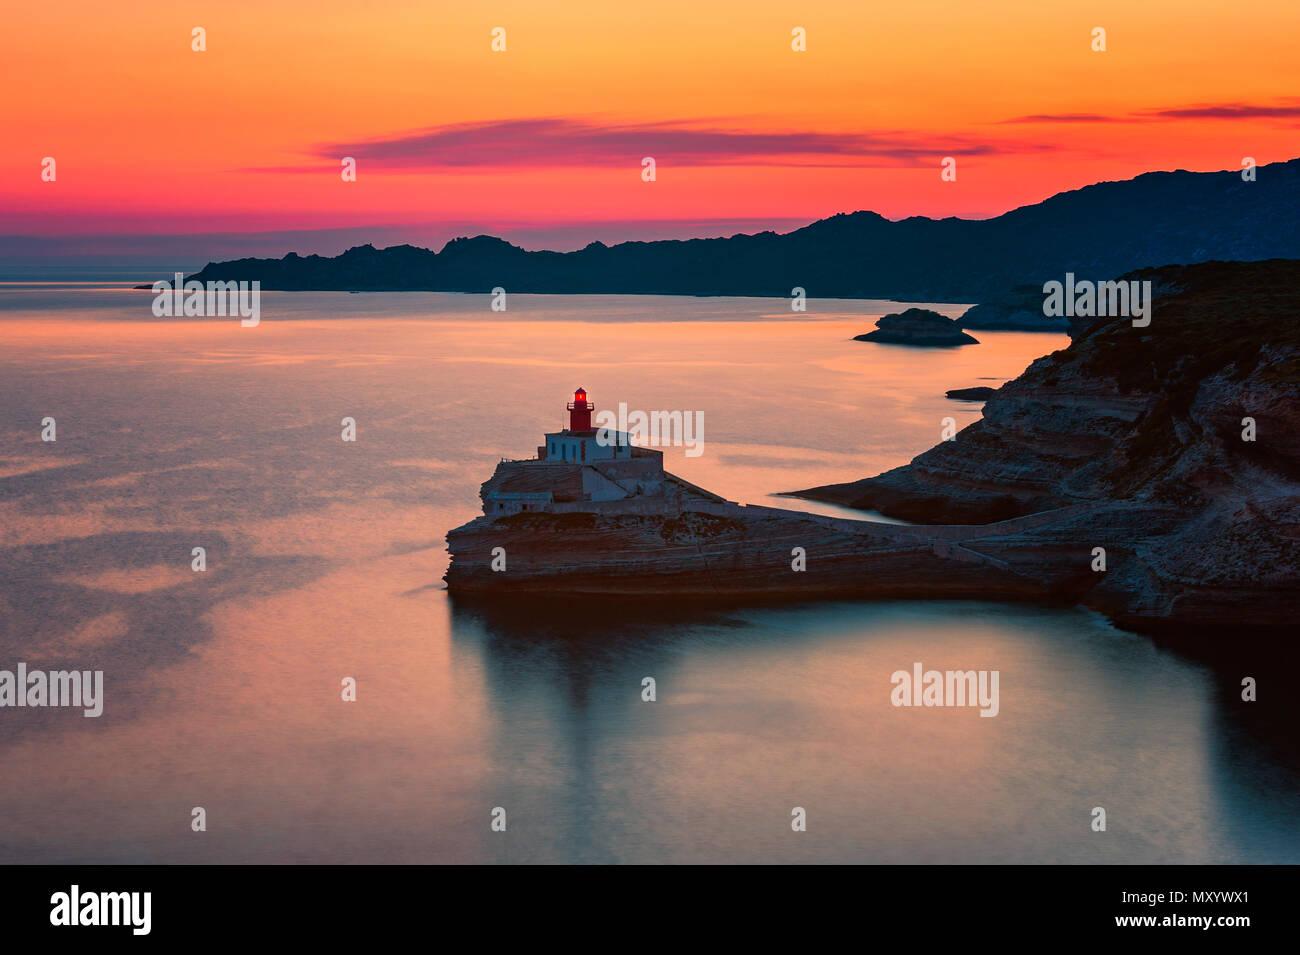 Lighthouse in Bonifacio, Corsica, France at Sunset - Stock Image